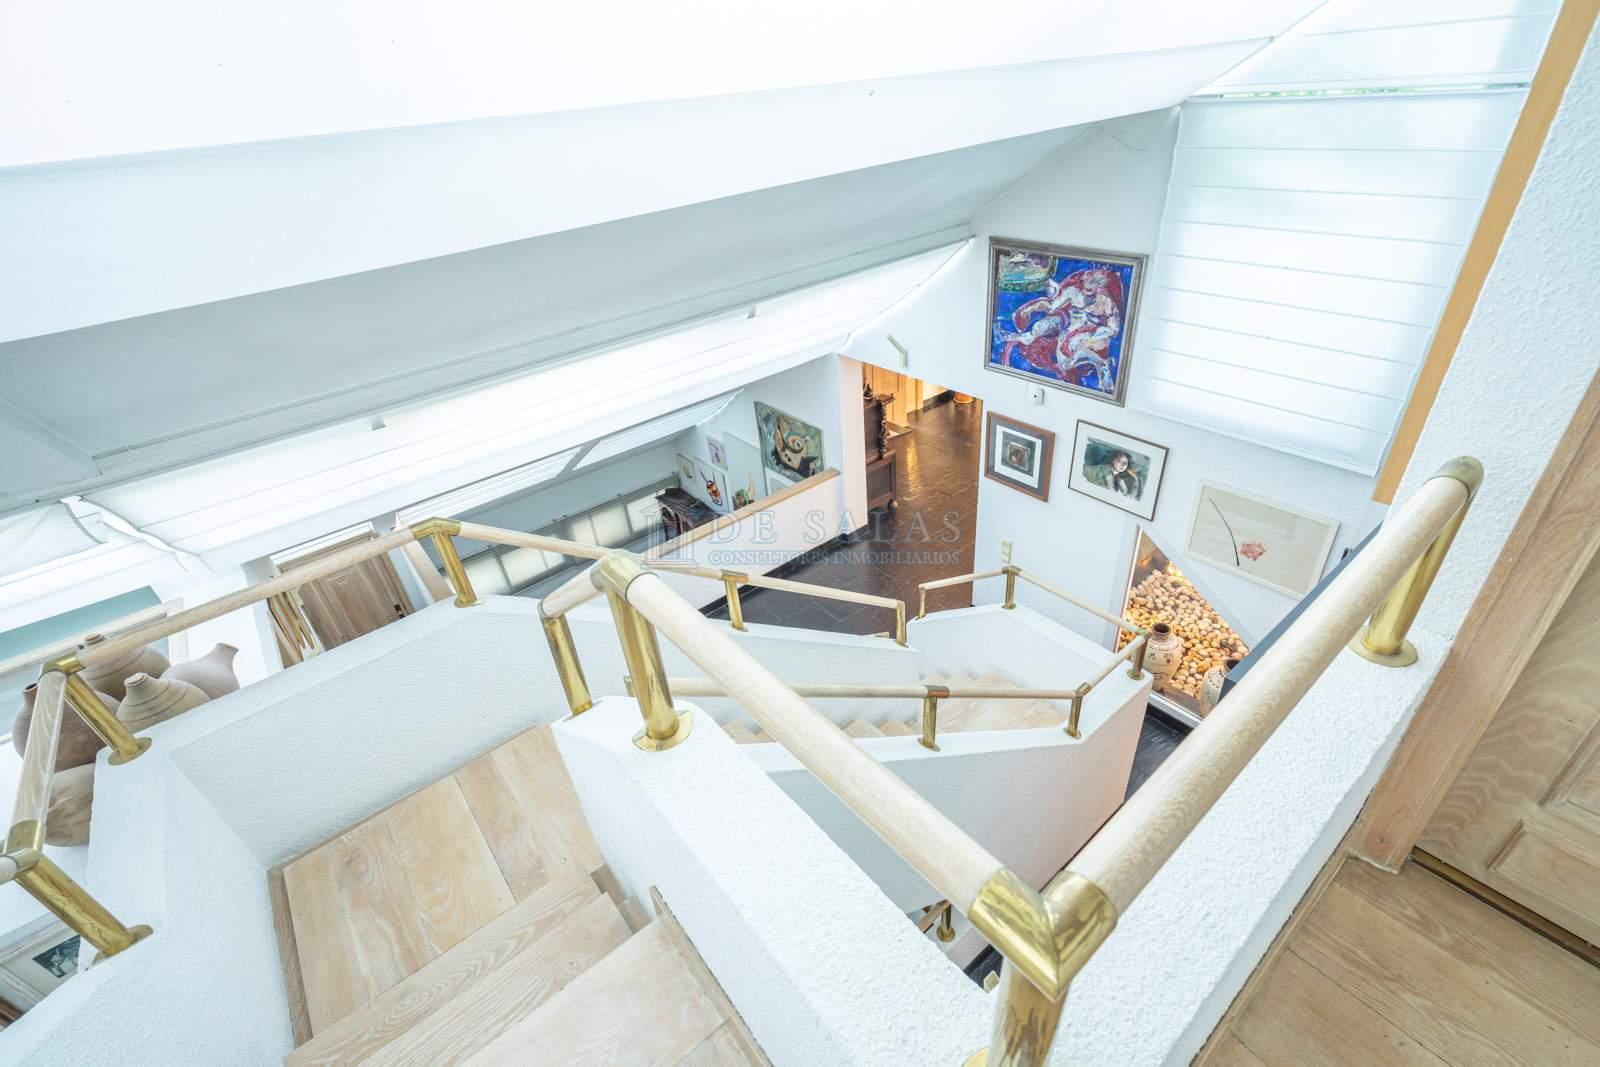 Escalera-39 House La Moraleja